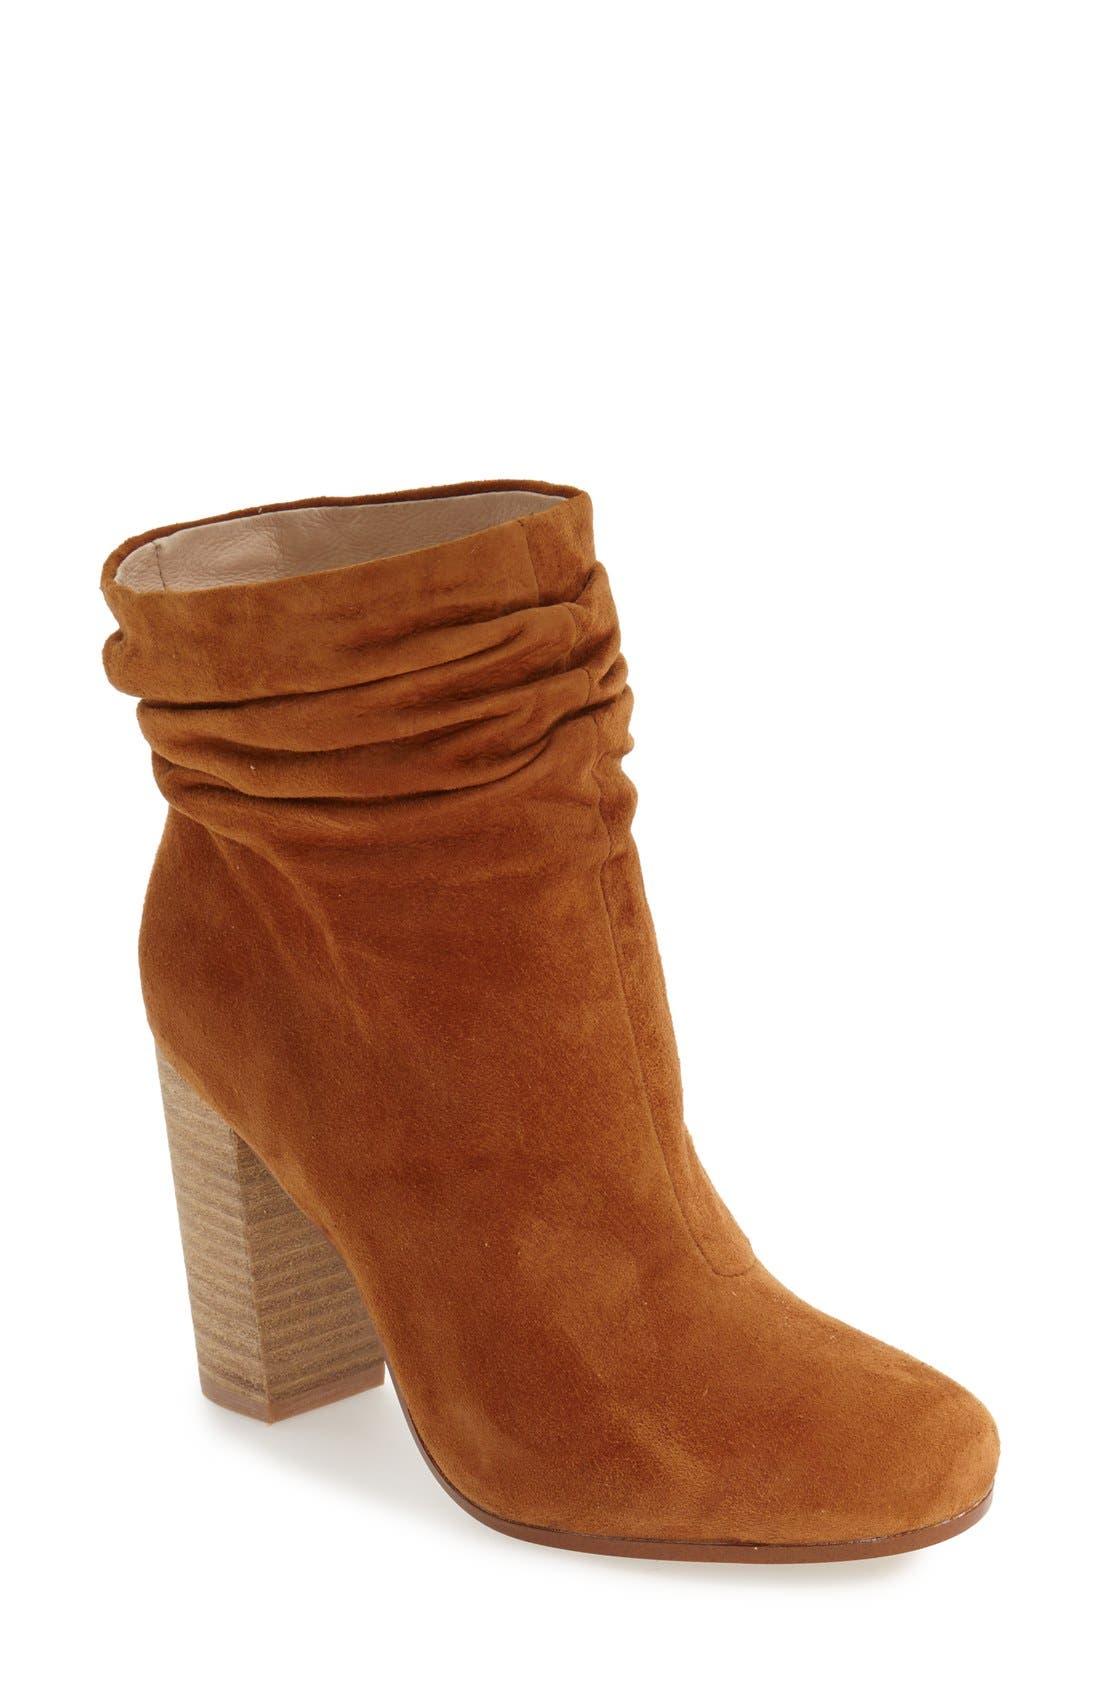 Georgie Block Heel Boot,                             Main thumbnail 1, color,                             Caramel Suede